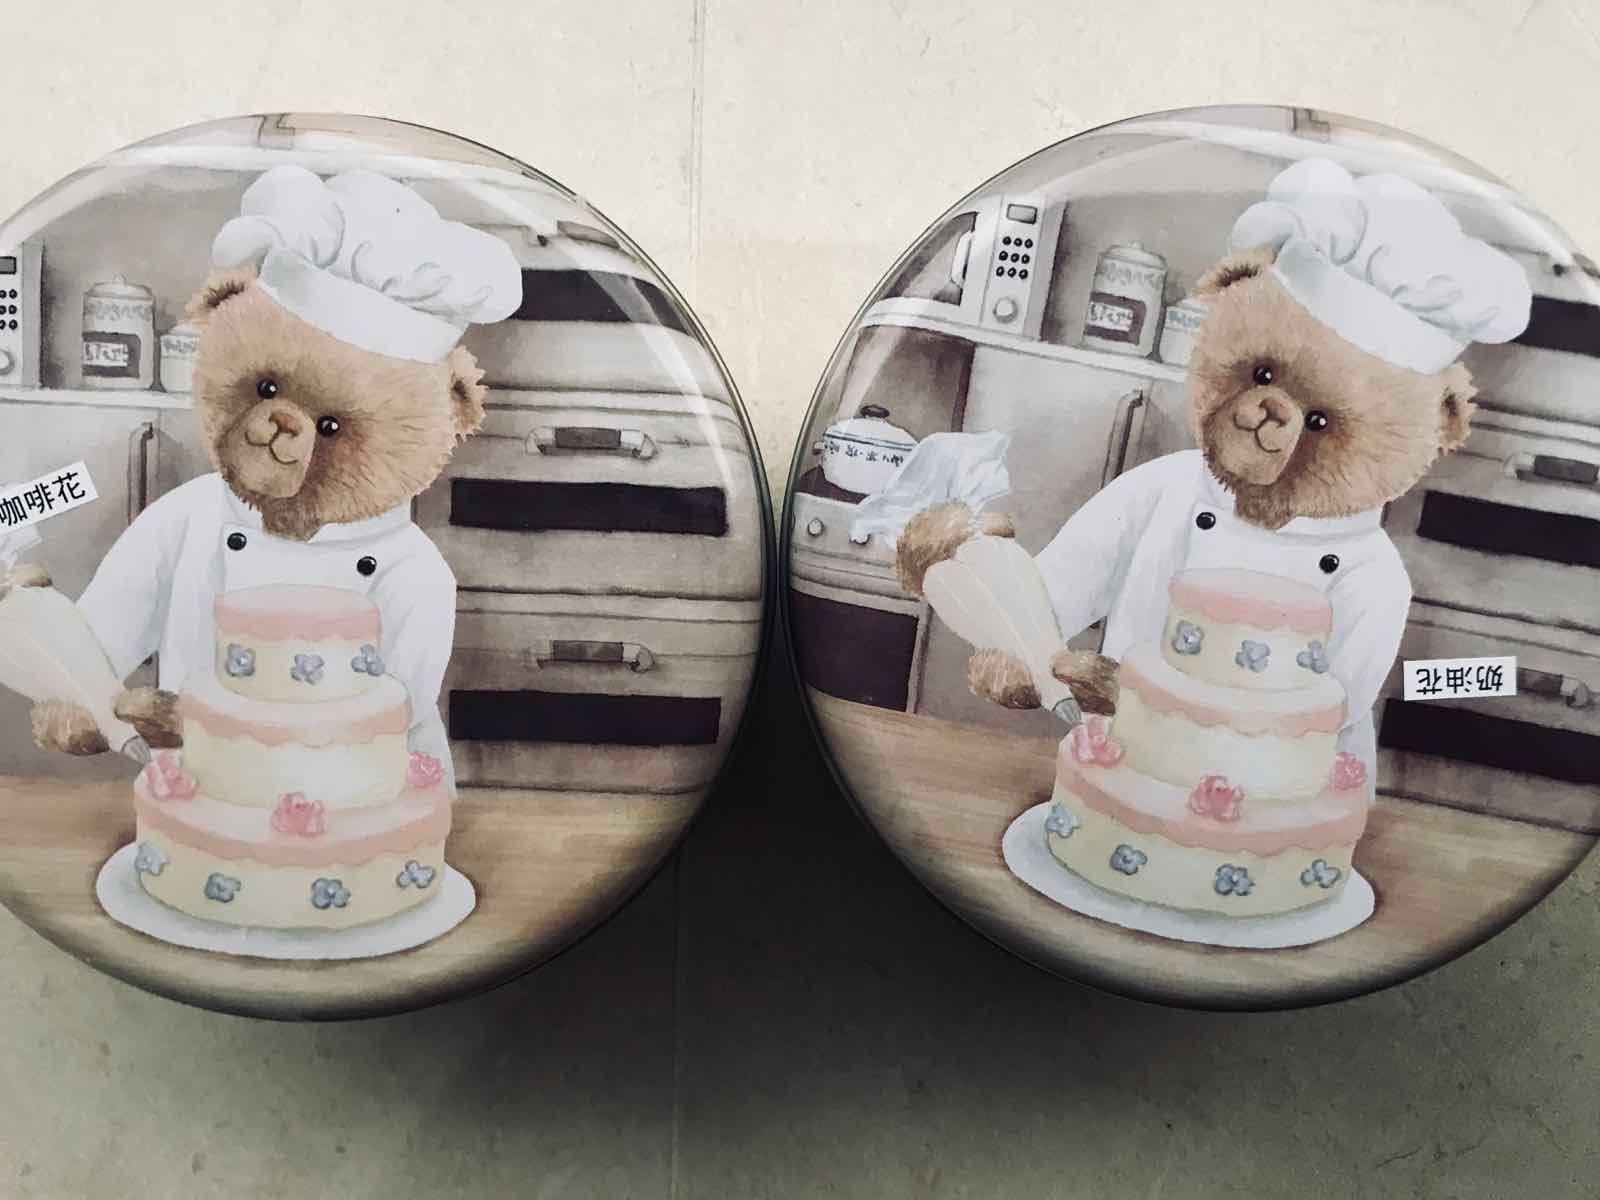 jenny-bakery-cookies.jpg